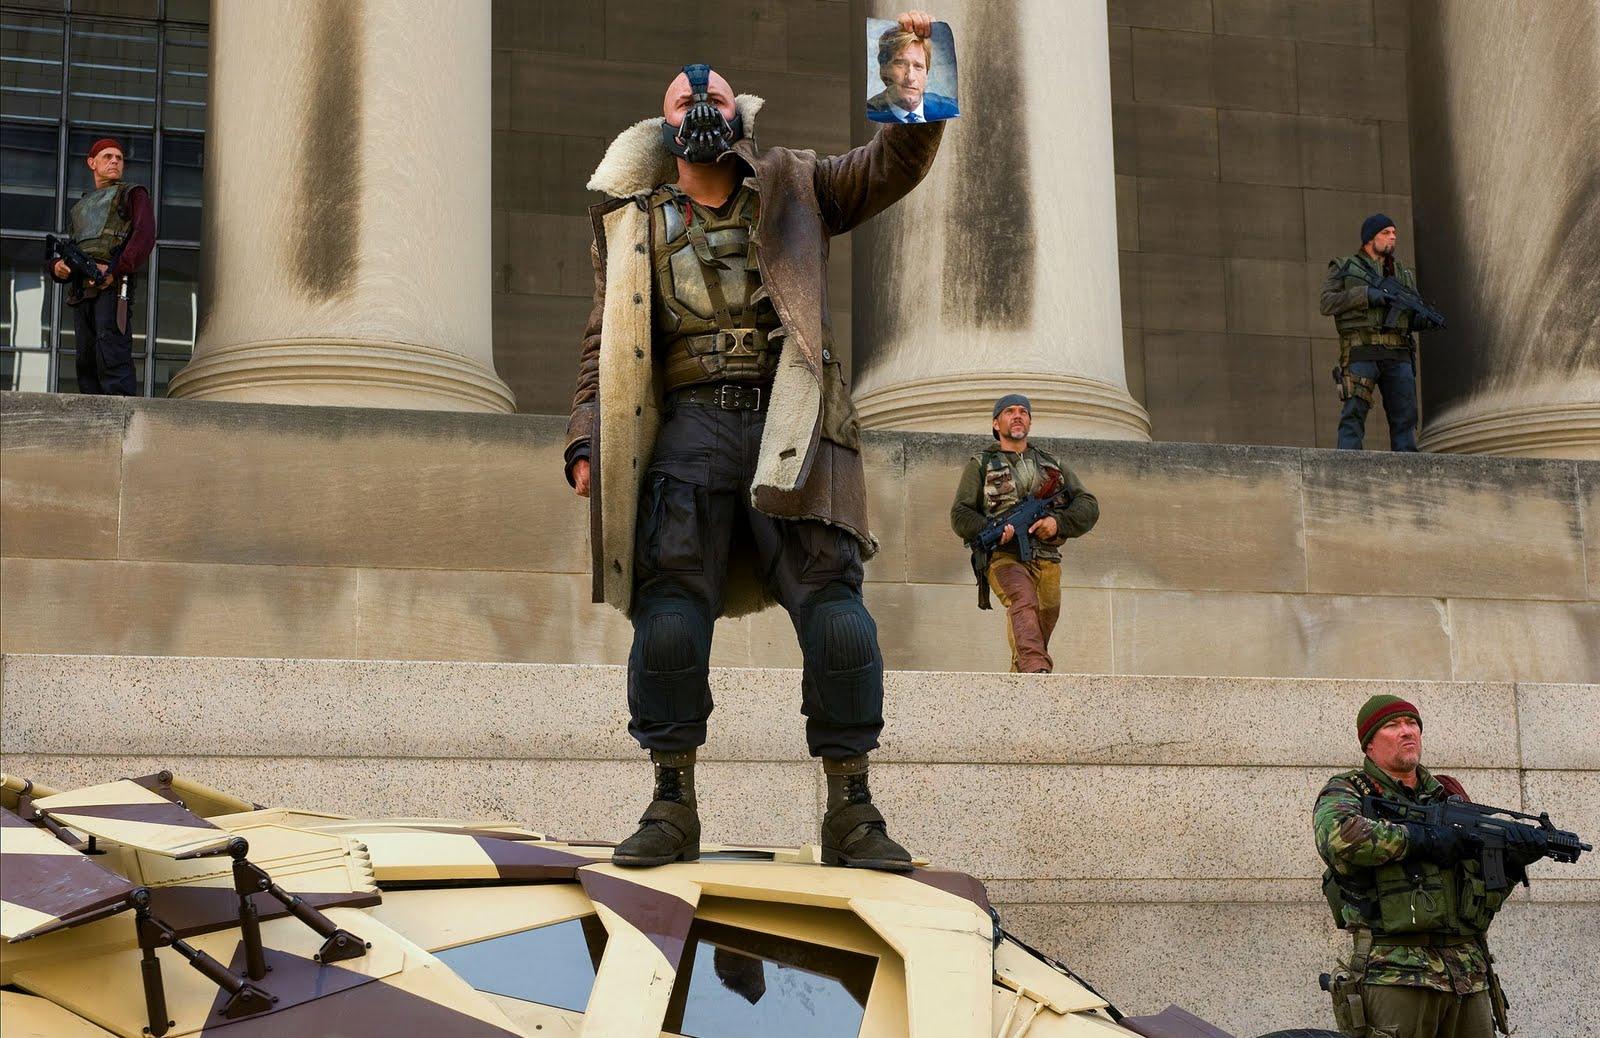 Tom Hardy stars as Bane in 'The Dark Knight Rises'.